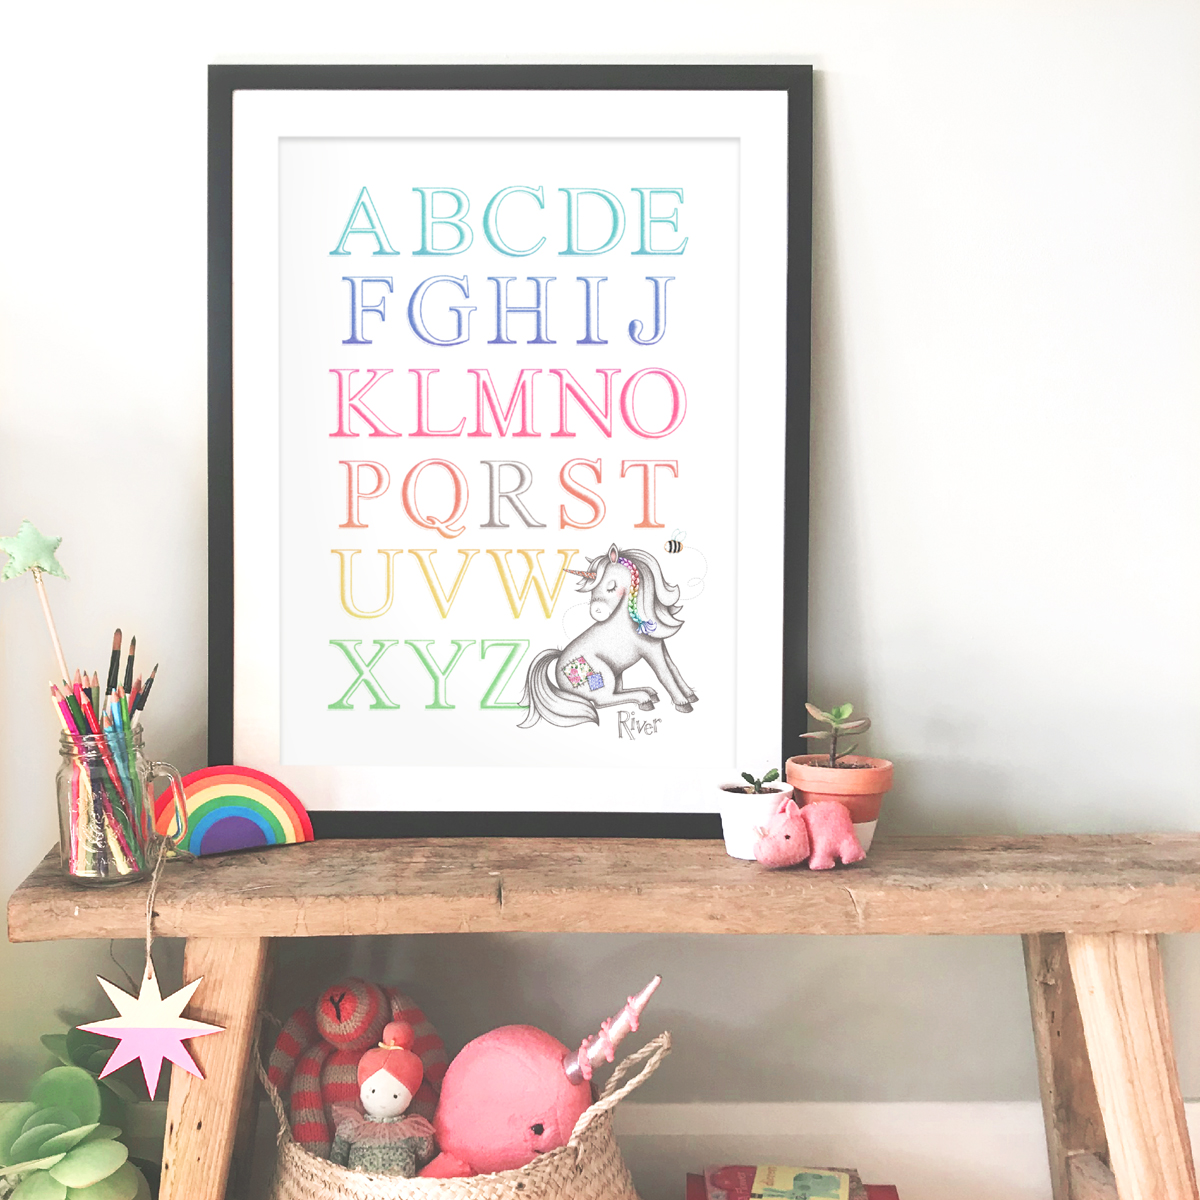 rainbow unicorn alpabet frame